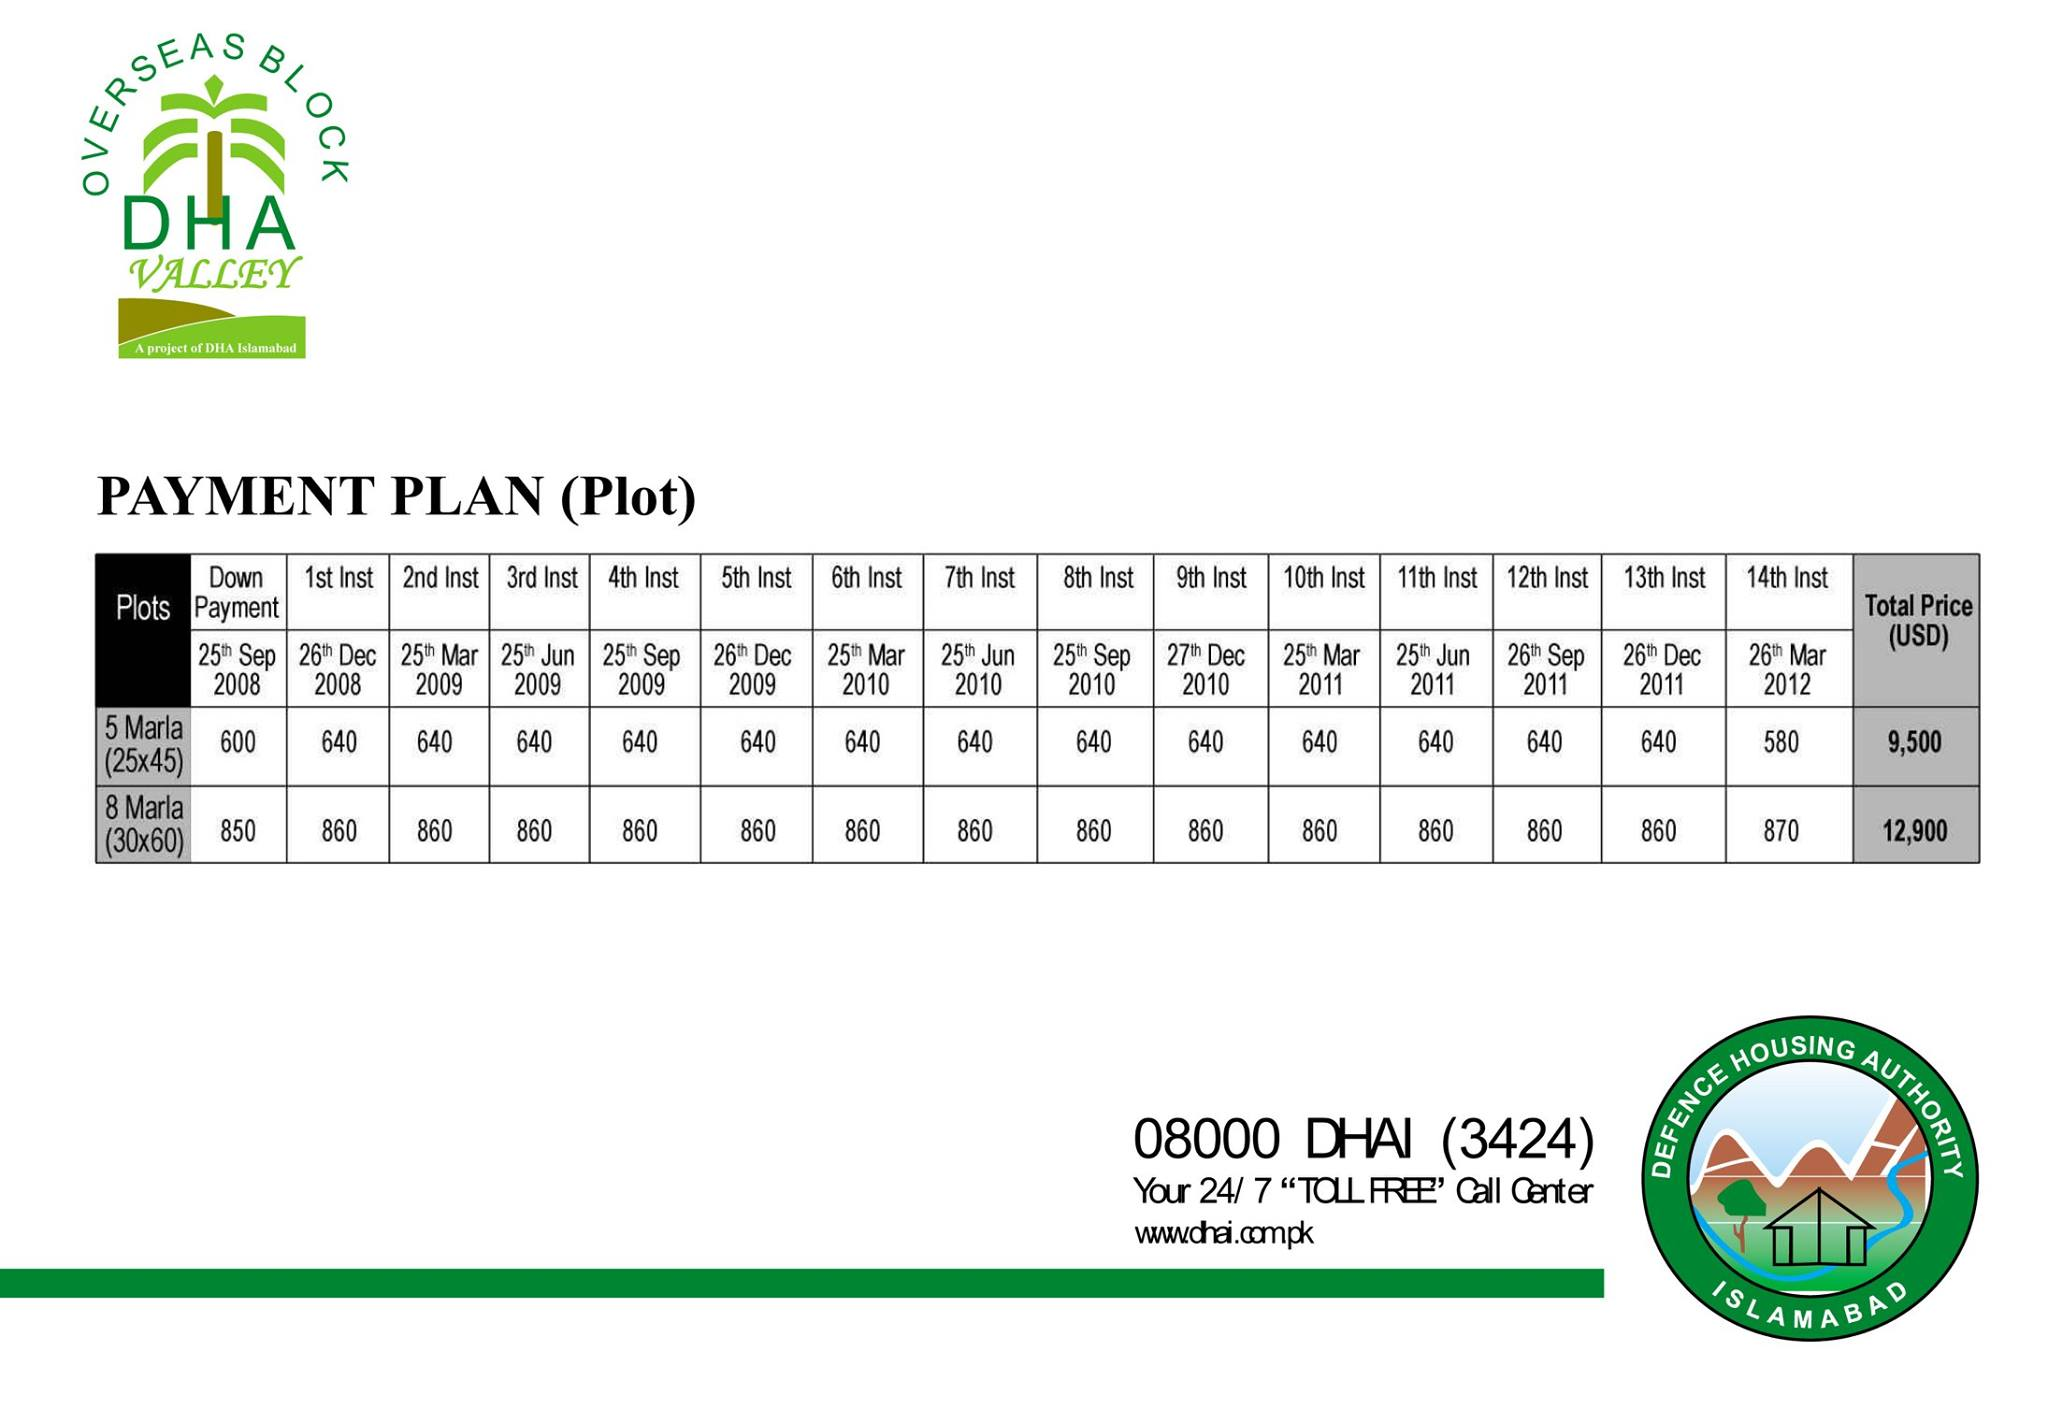 Overseas block payment plan of DHA Valley